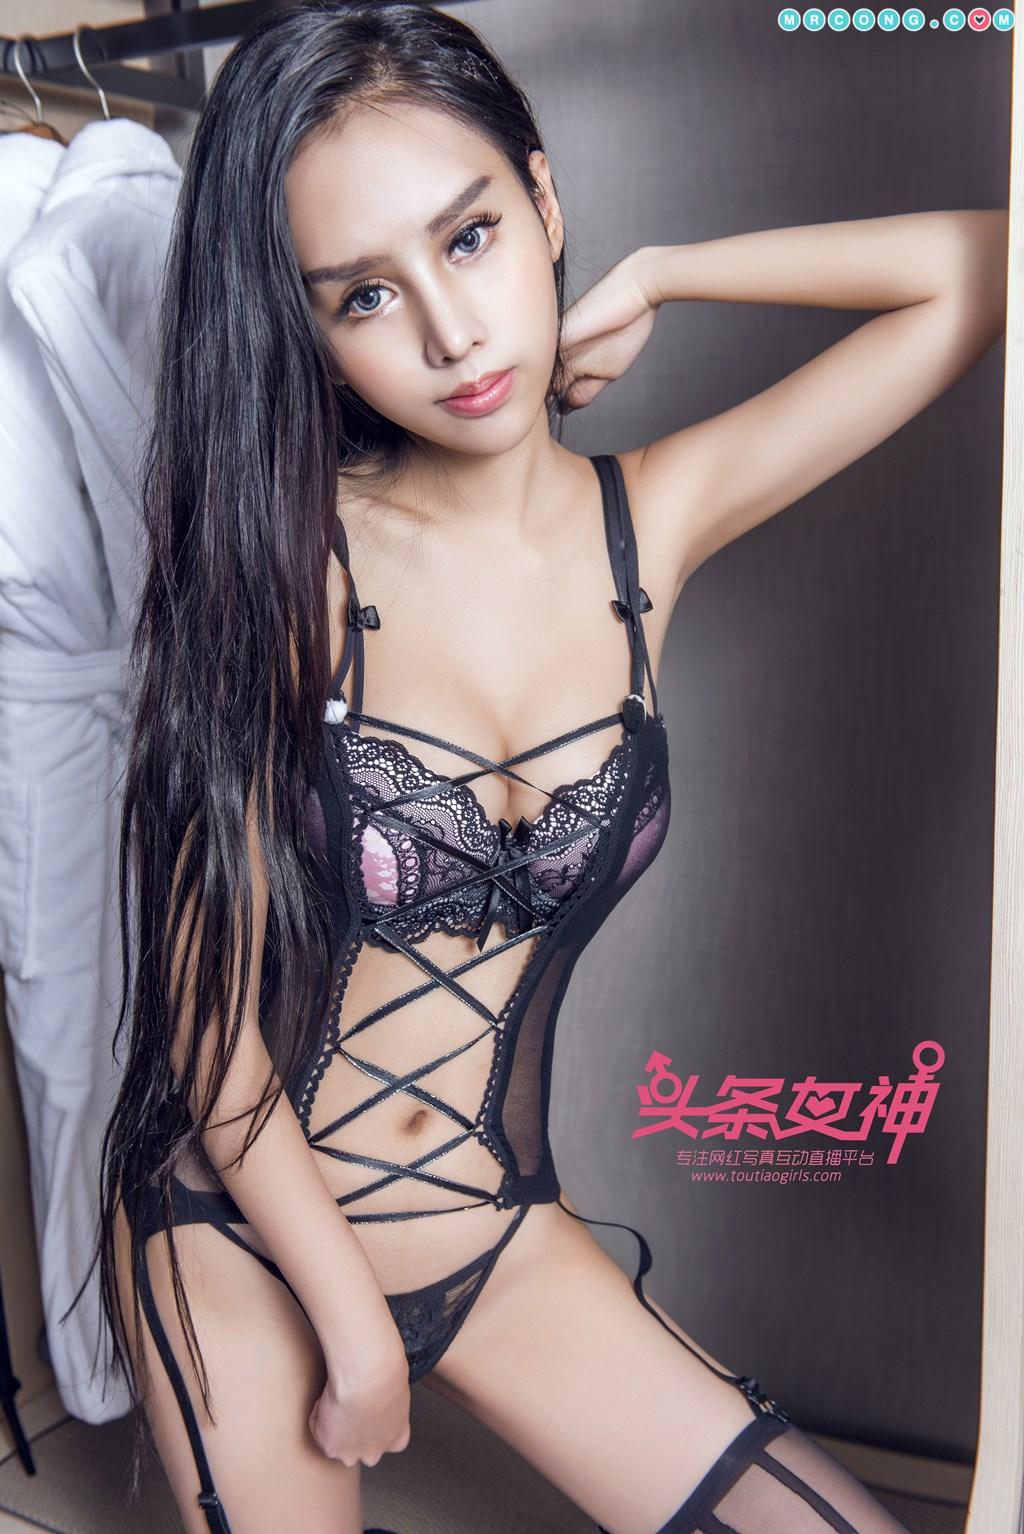 Image TouTiao-2017-12-05-Chen-Di-Ya-MrCong.com-019 in post TouTiao 2017-12-05: Người mẫu Chen Di Ya (陈迪垭) (35 ảnh)